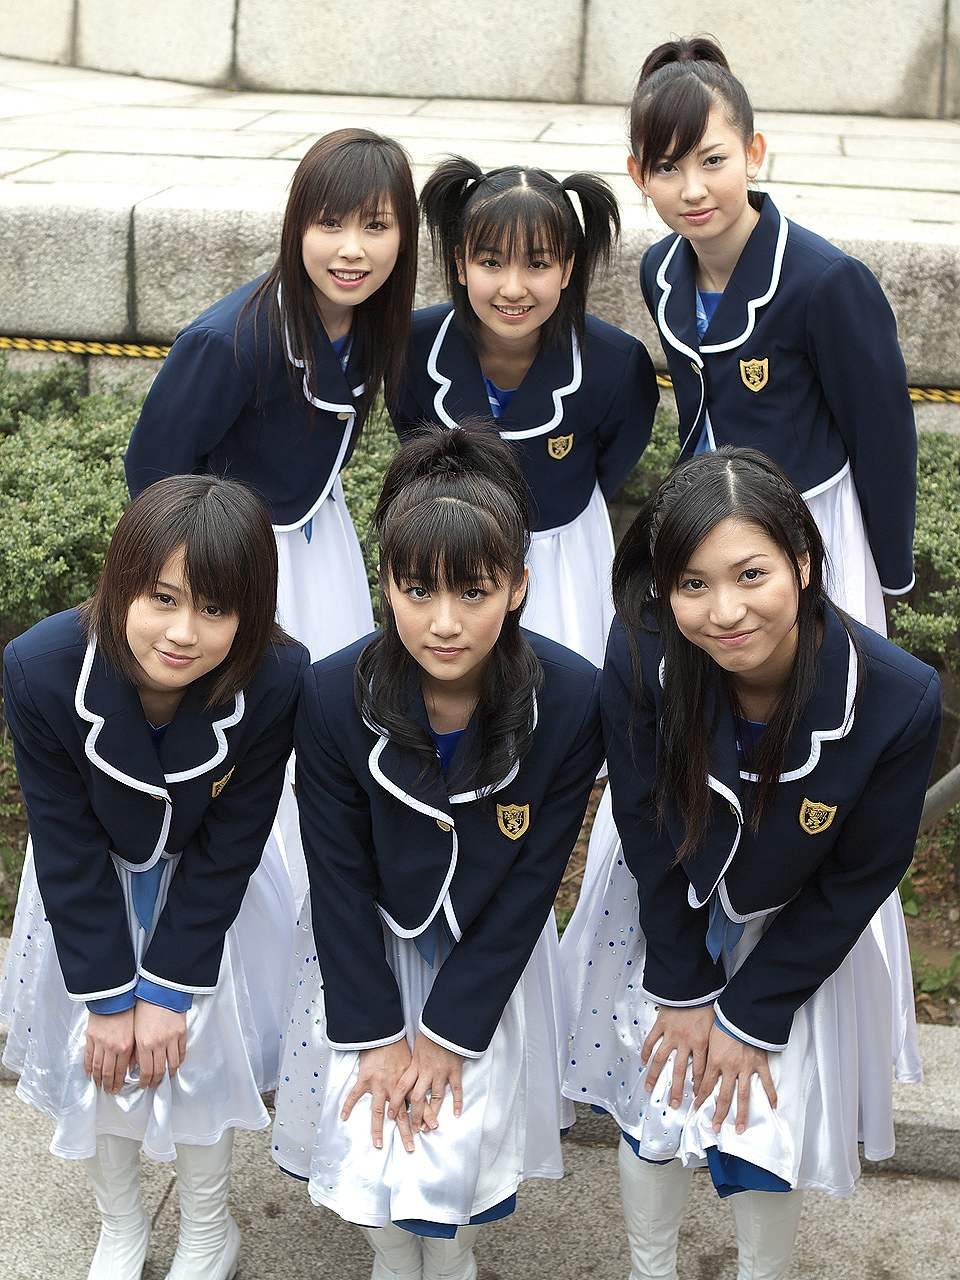 AKB48初期の前田敦子、高橋みなみ、河西智美、中西里菜、板野友美、小嶋陽菜